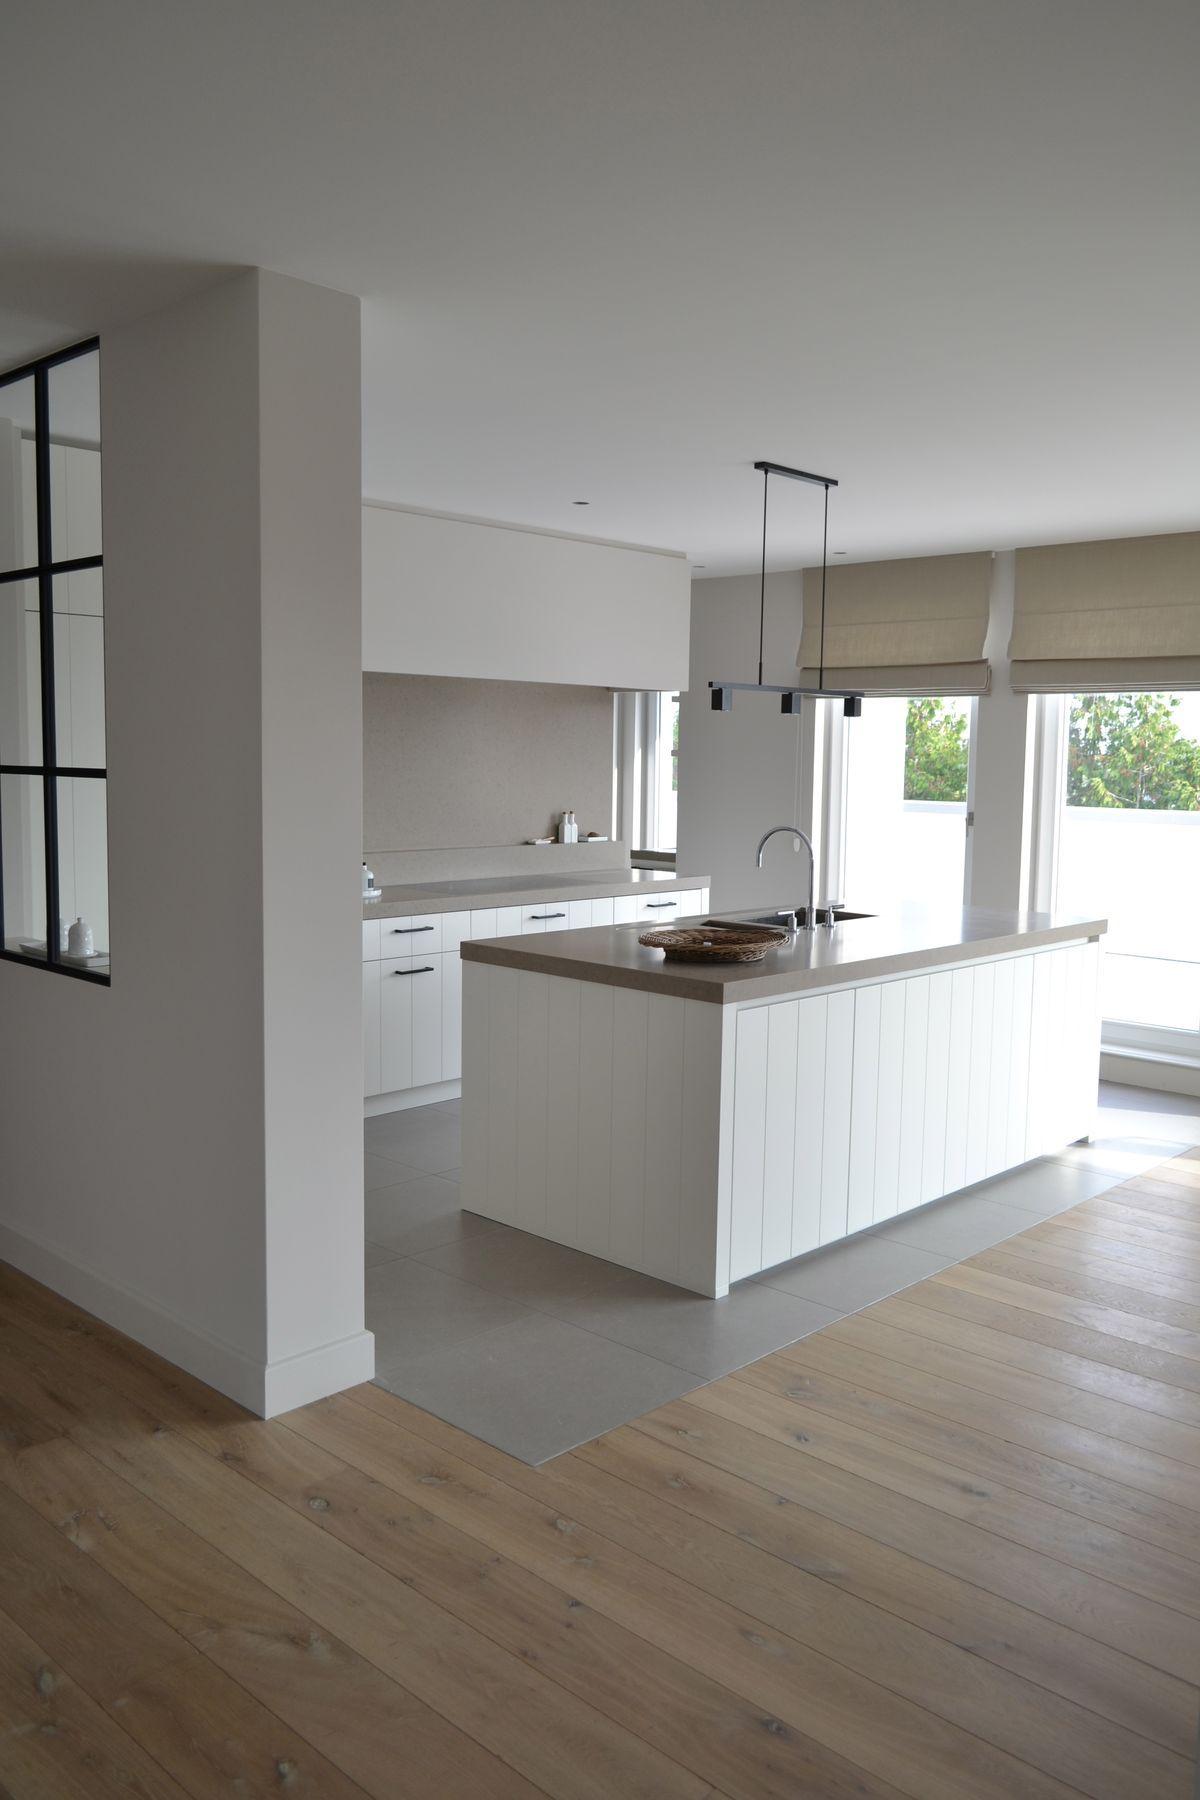 offene k che pour cuisine home decor pinterest k k vita k k and hus. Black Bedroom Furniture Sets. Home Design Ideas